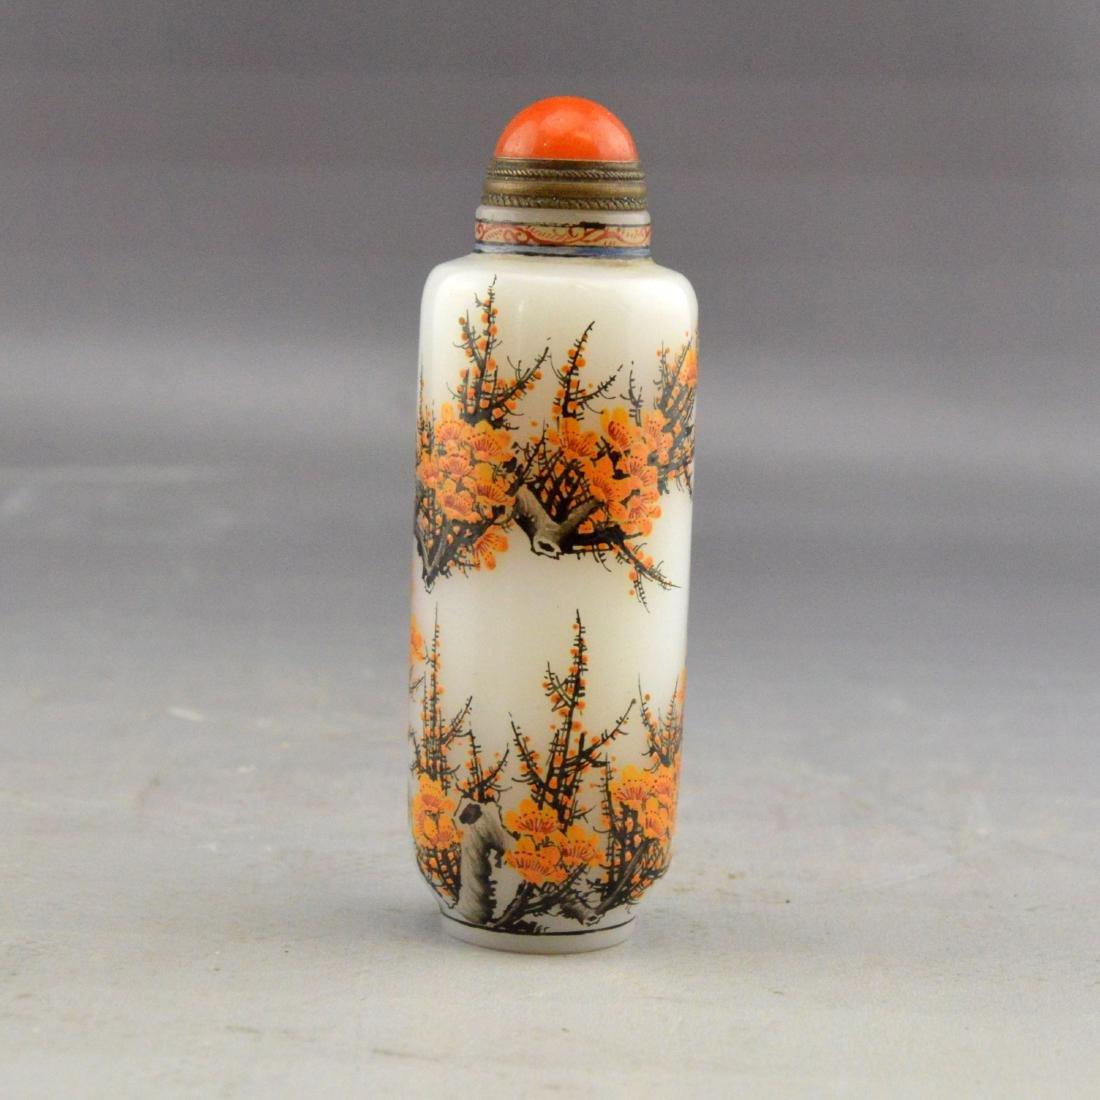 Liuli Snuff Bottle - 3